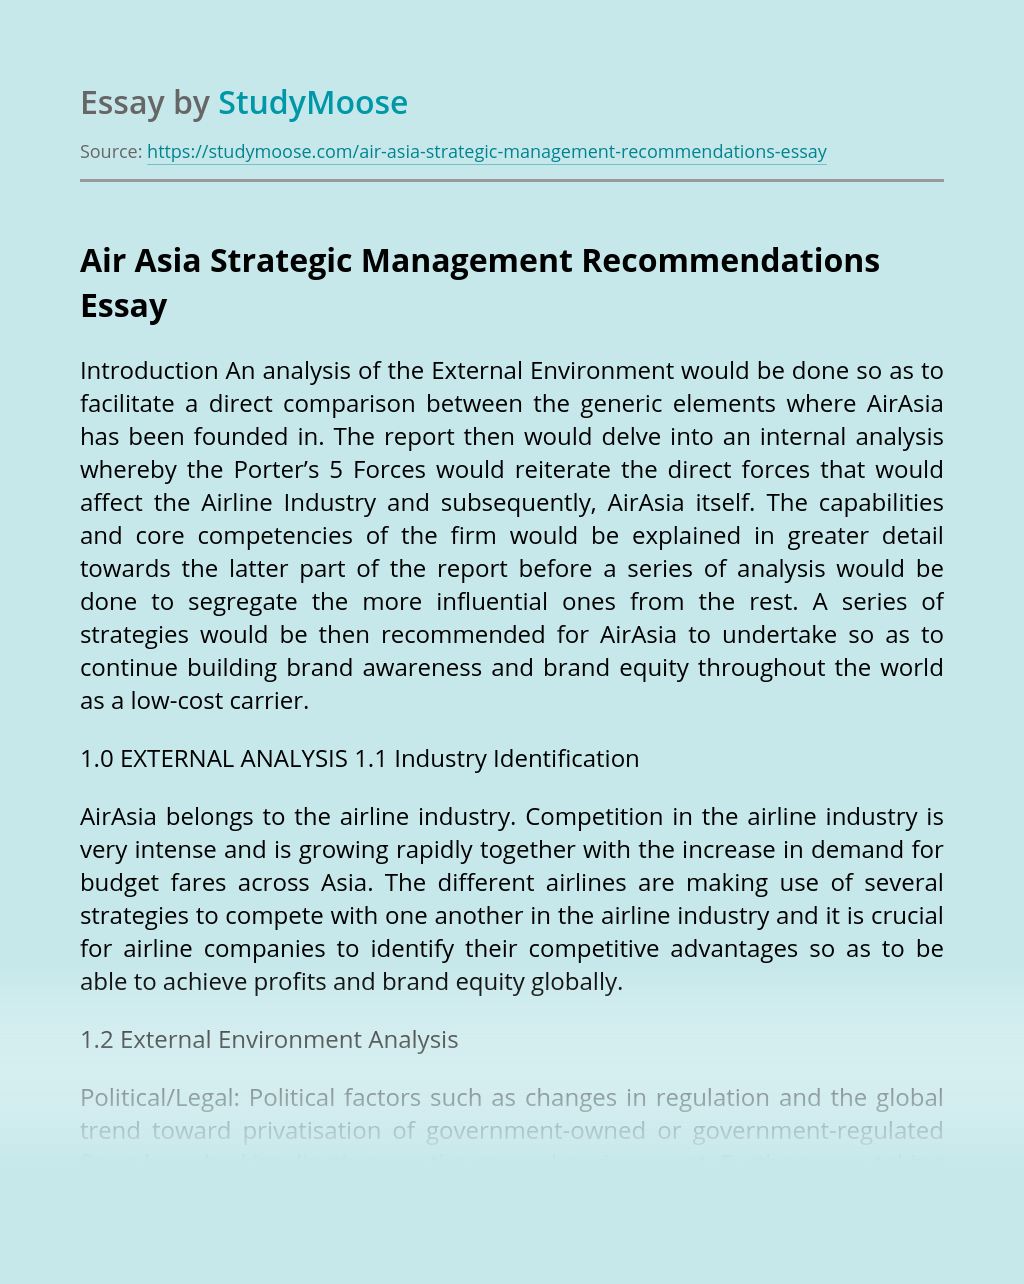 Air Asia Strategic Management Recommendations